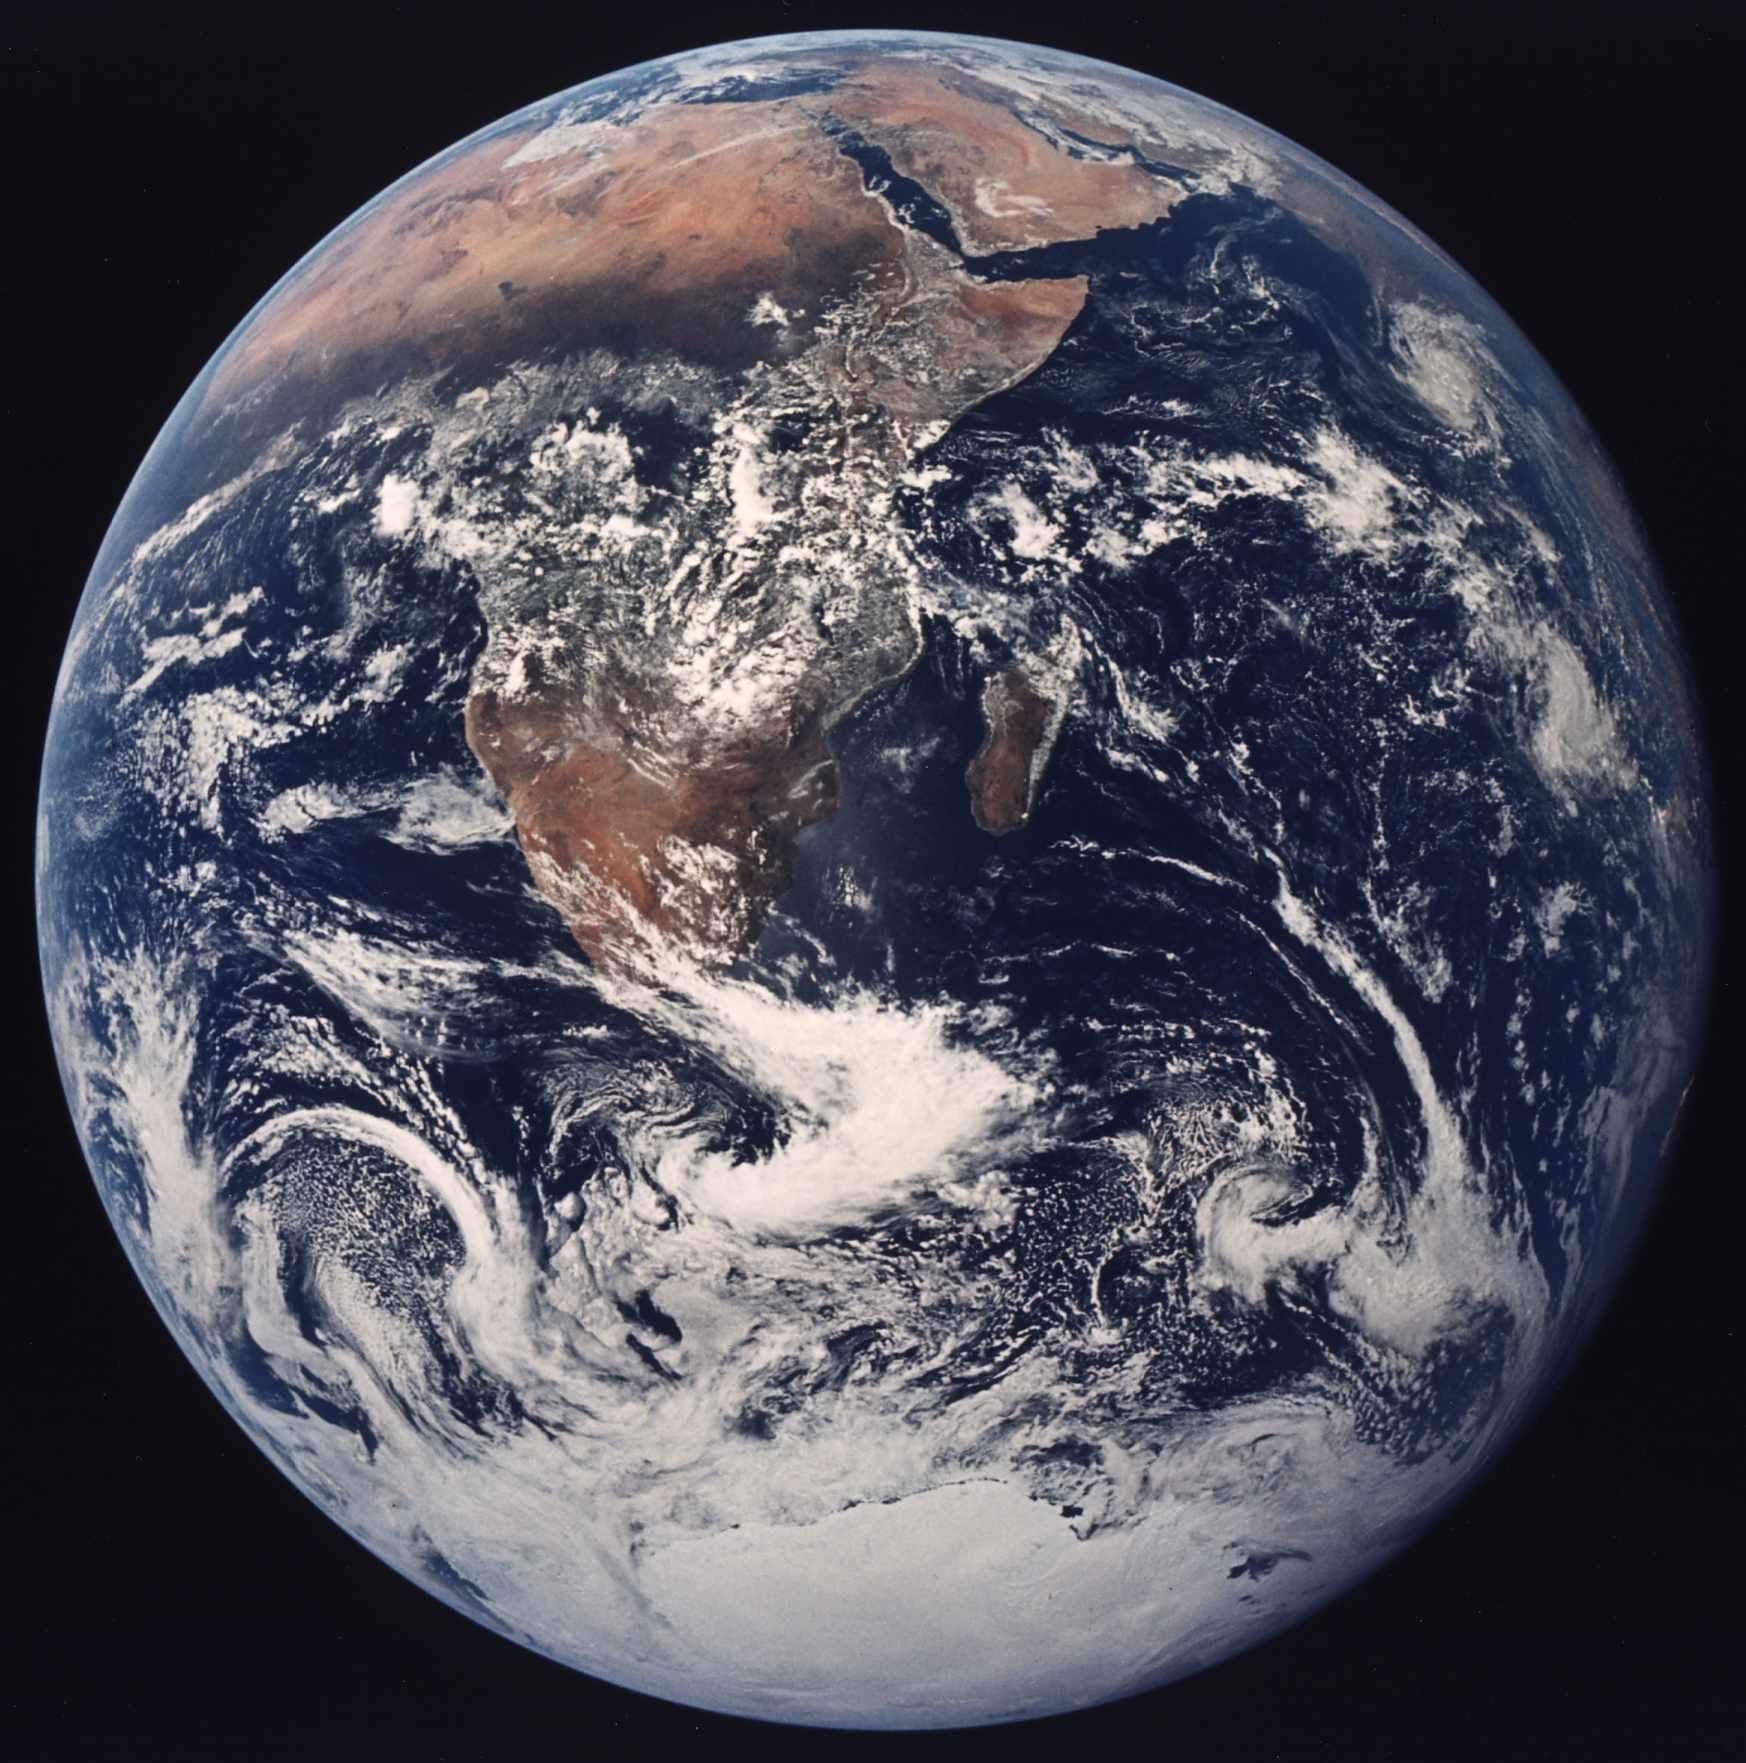 High Resolution Wallpaper | Earth 1746x1763 px